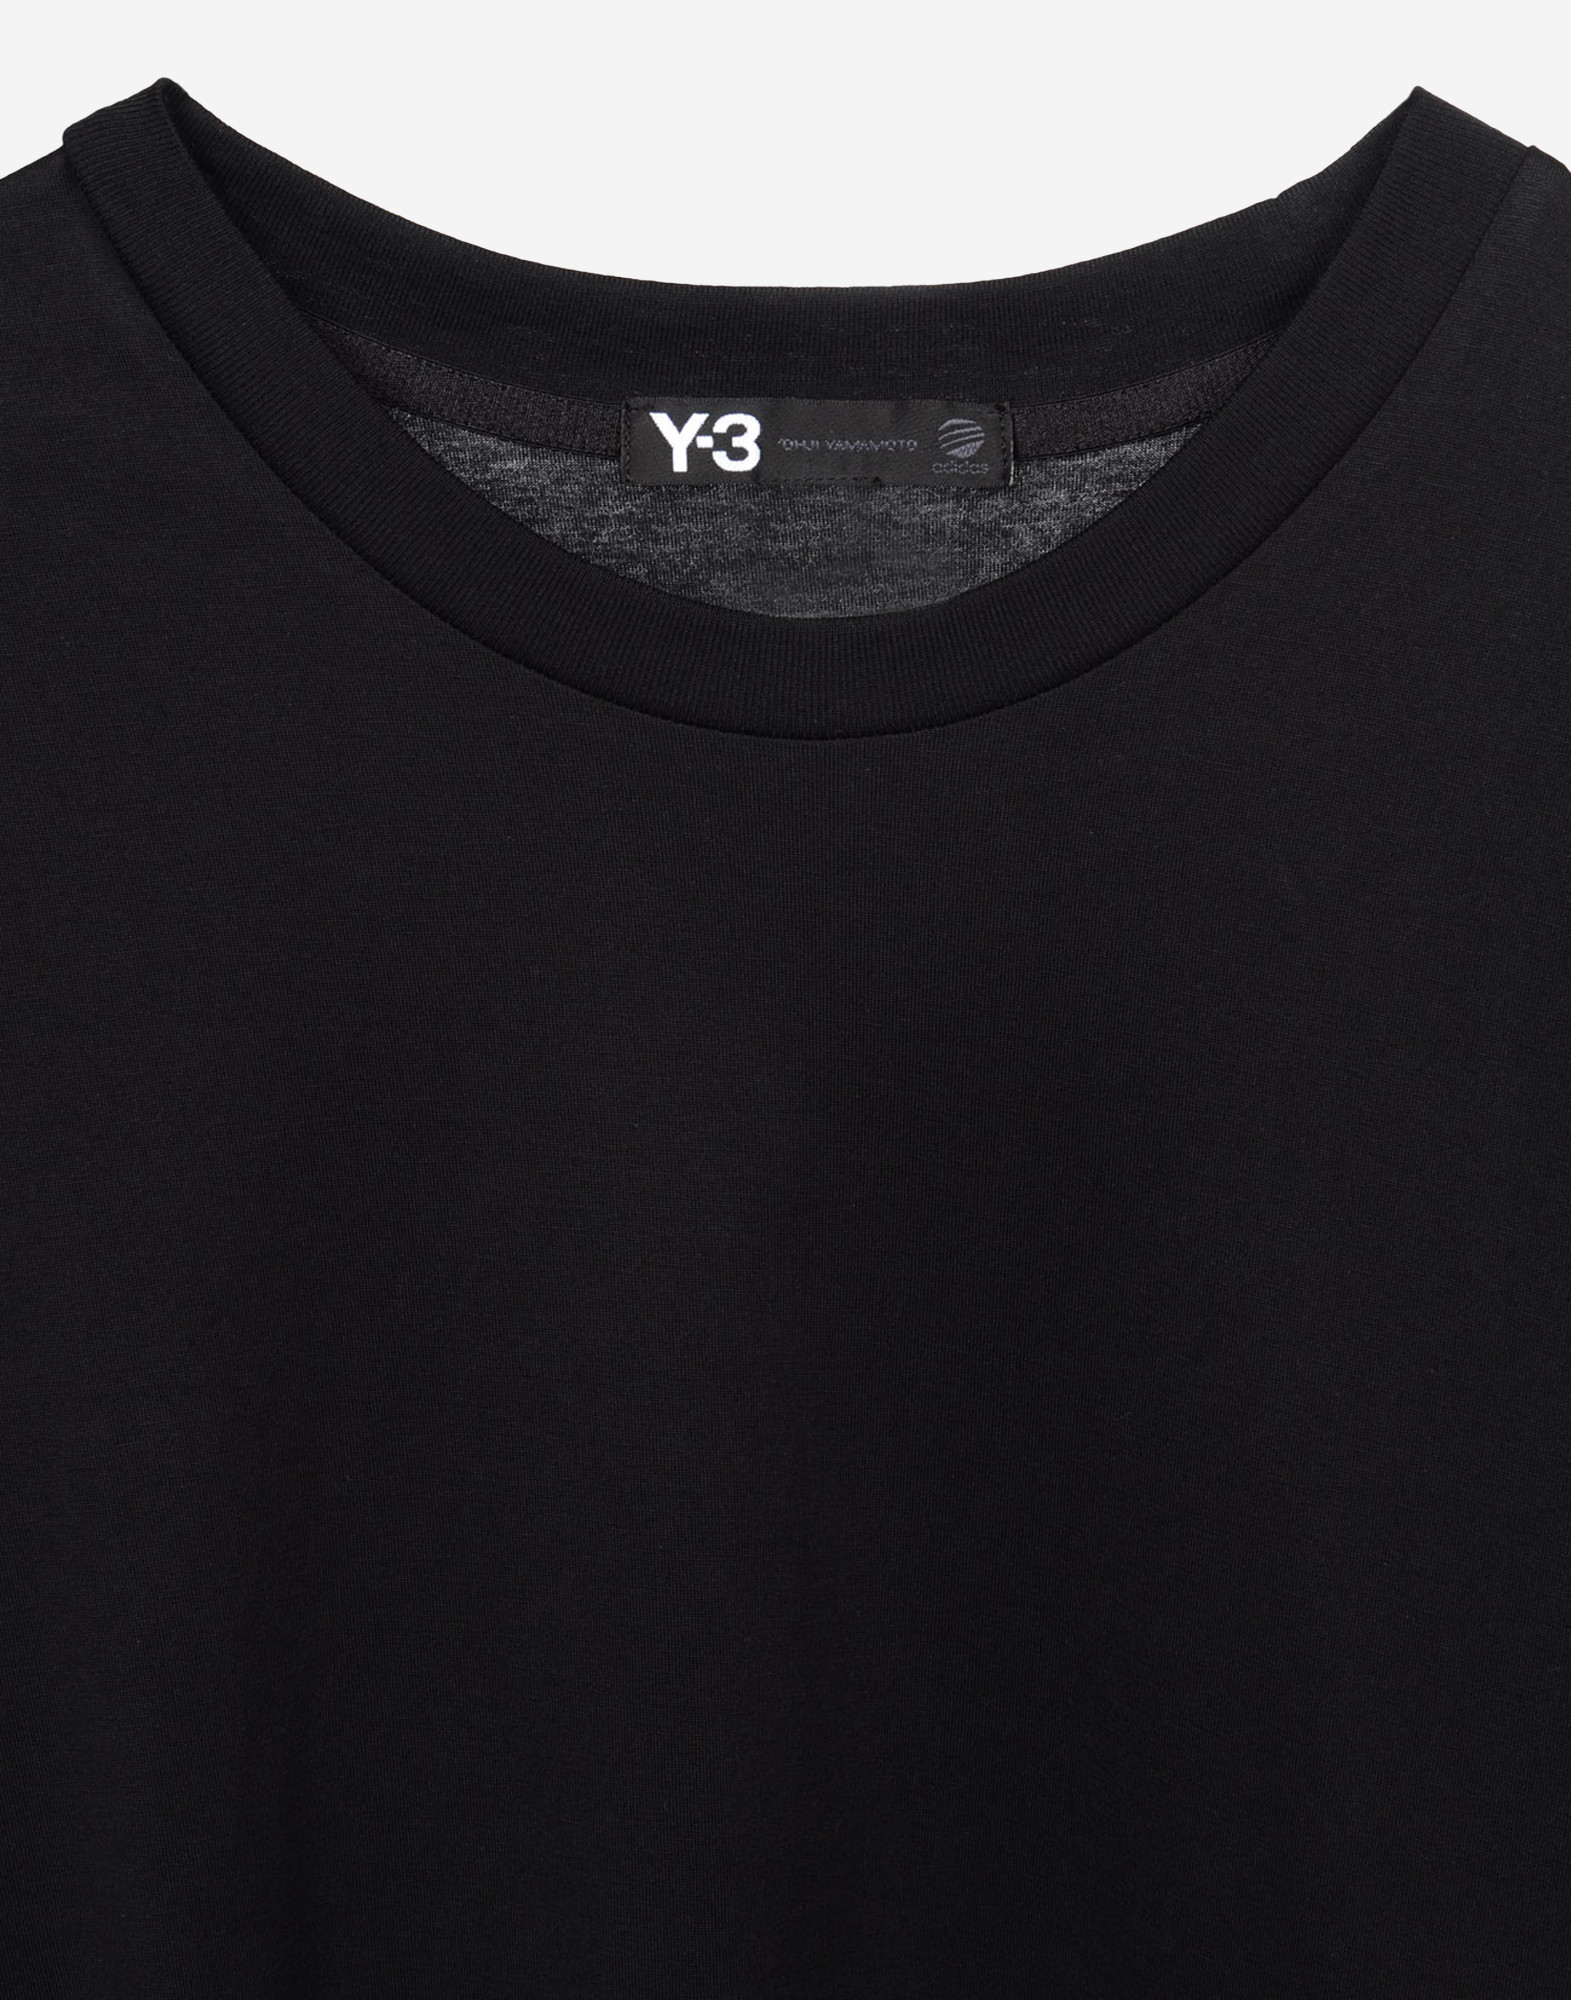 ec62ce6cc ... Y-3 Y-3 Skull Tee Short sleeve t-shirt Man d ...